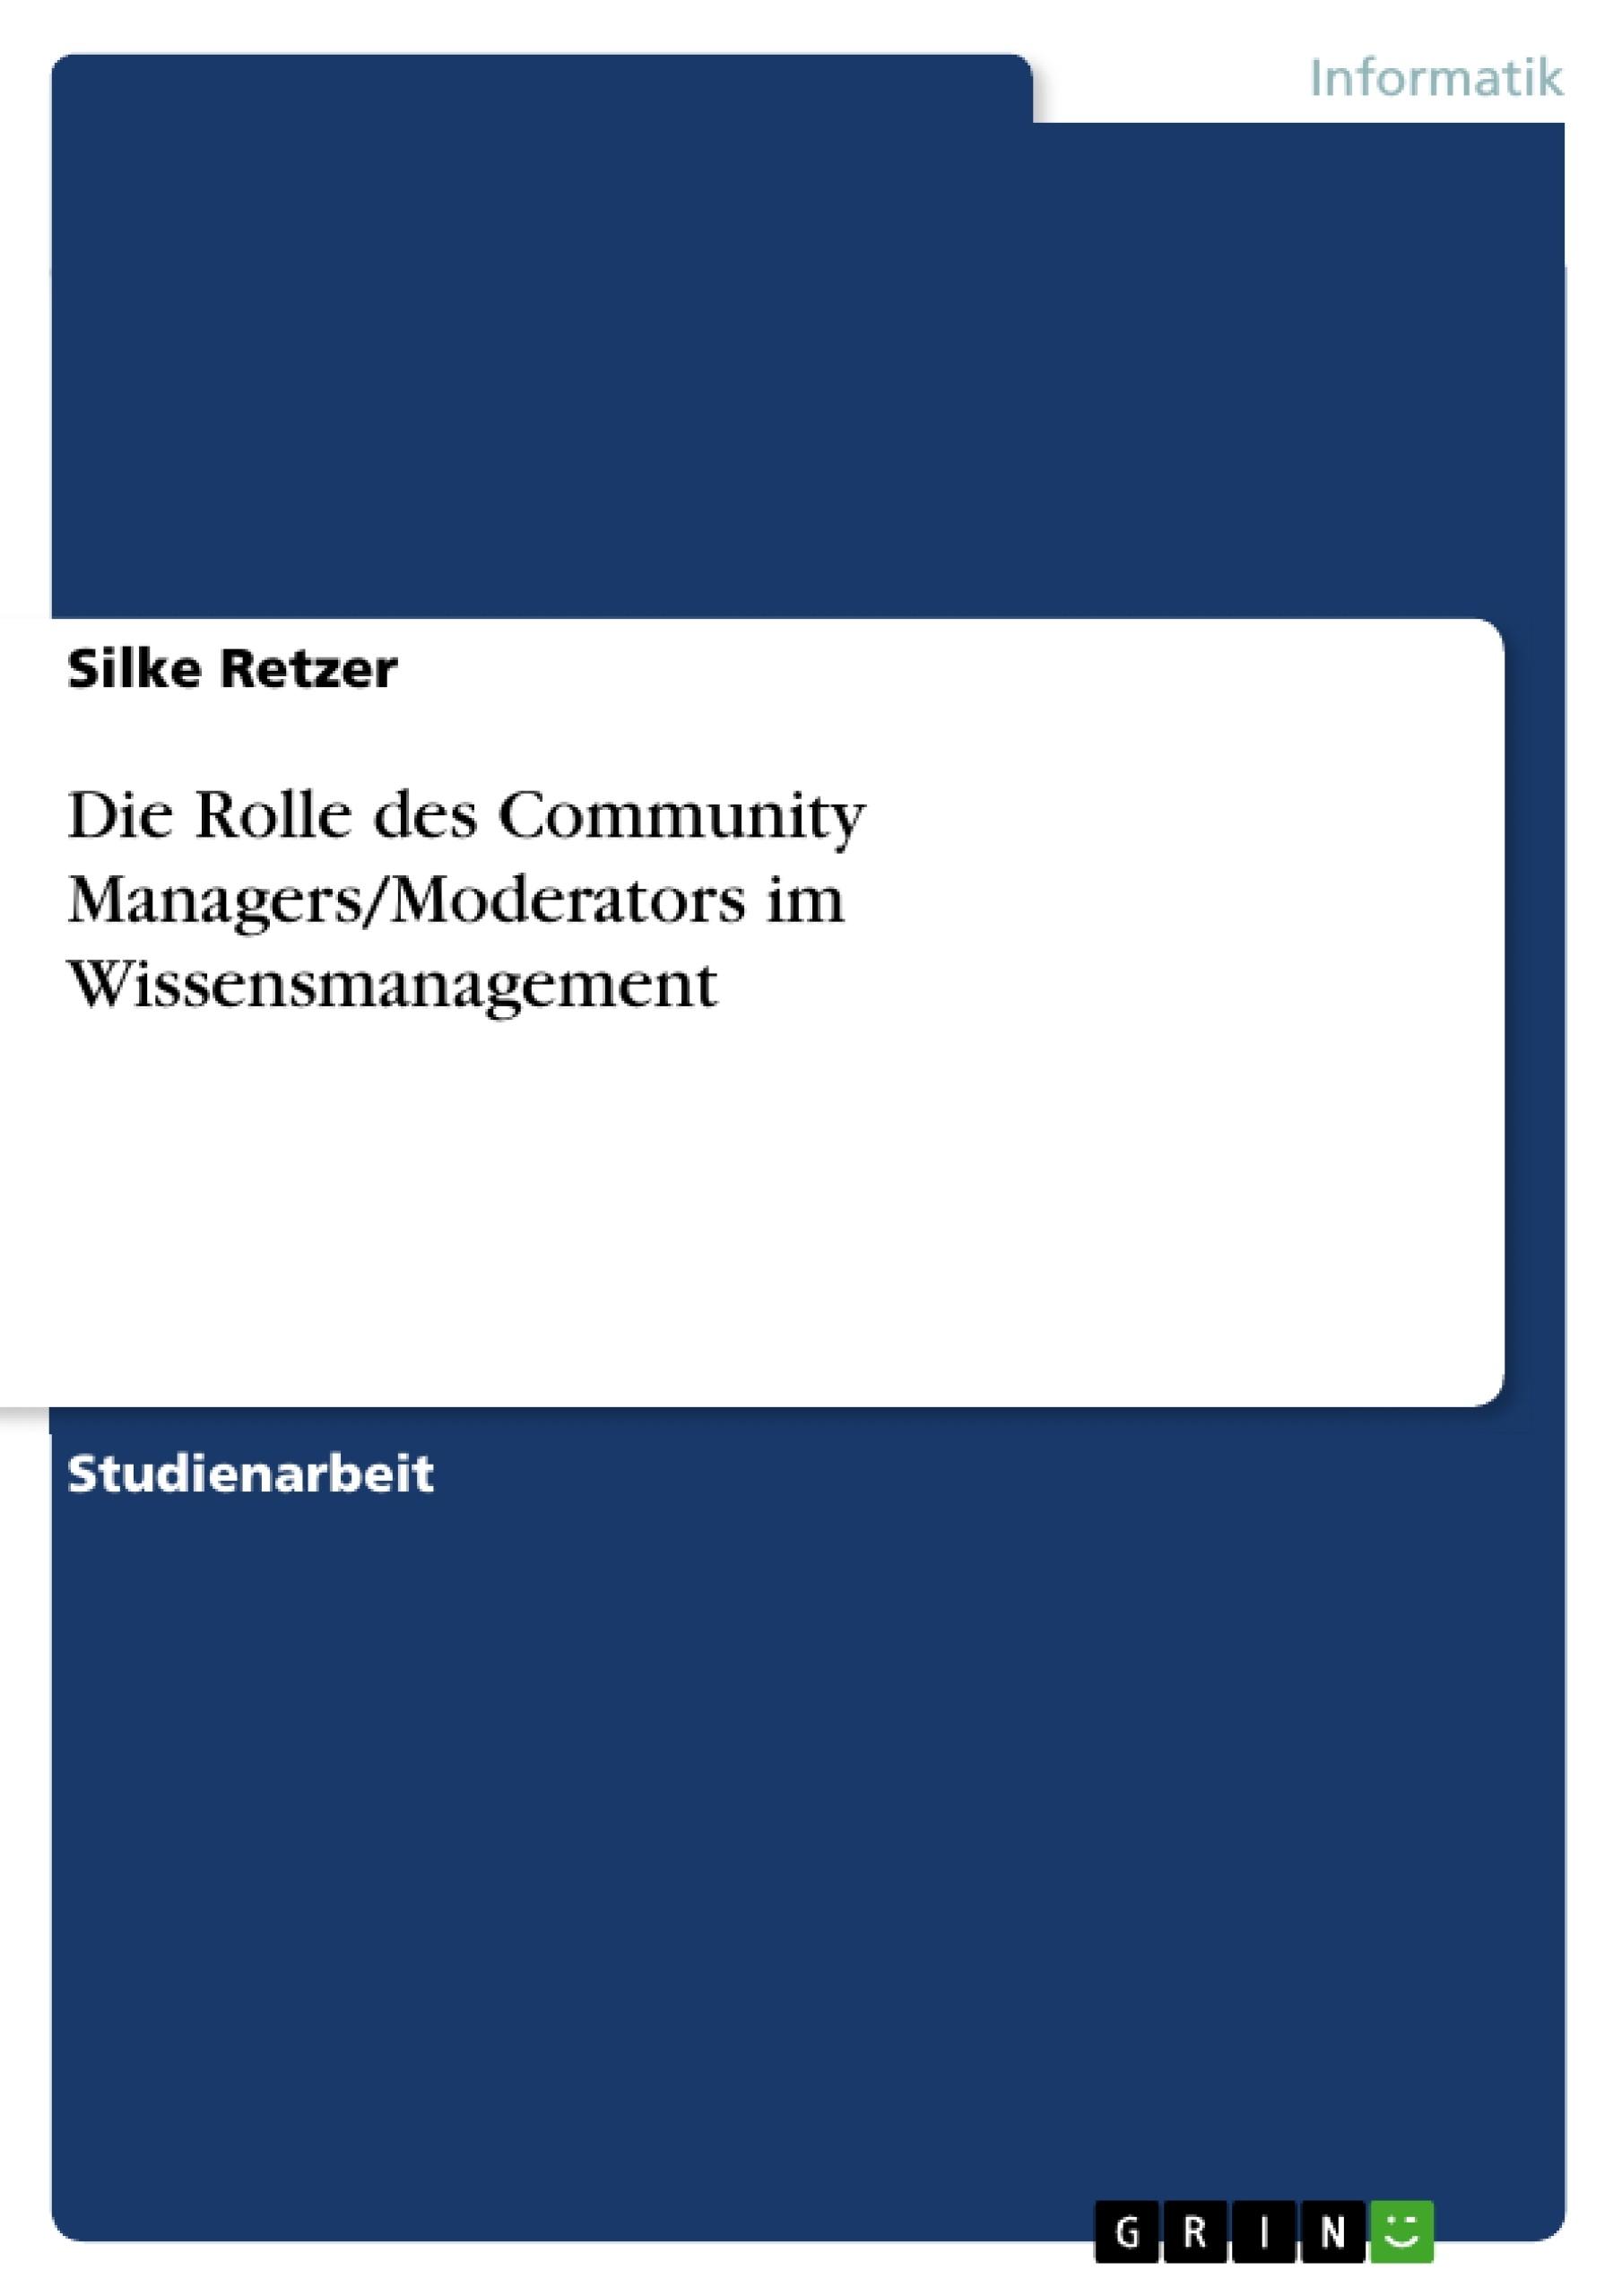 Titel: Die Rolle des Community Managers/Moderators im Wissensmanagement